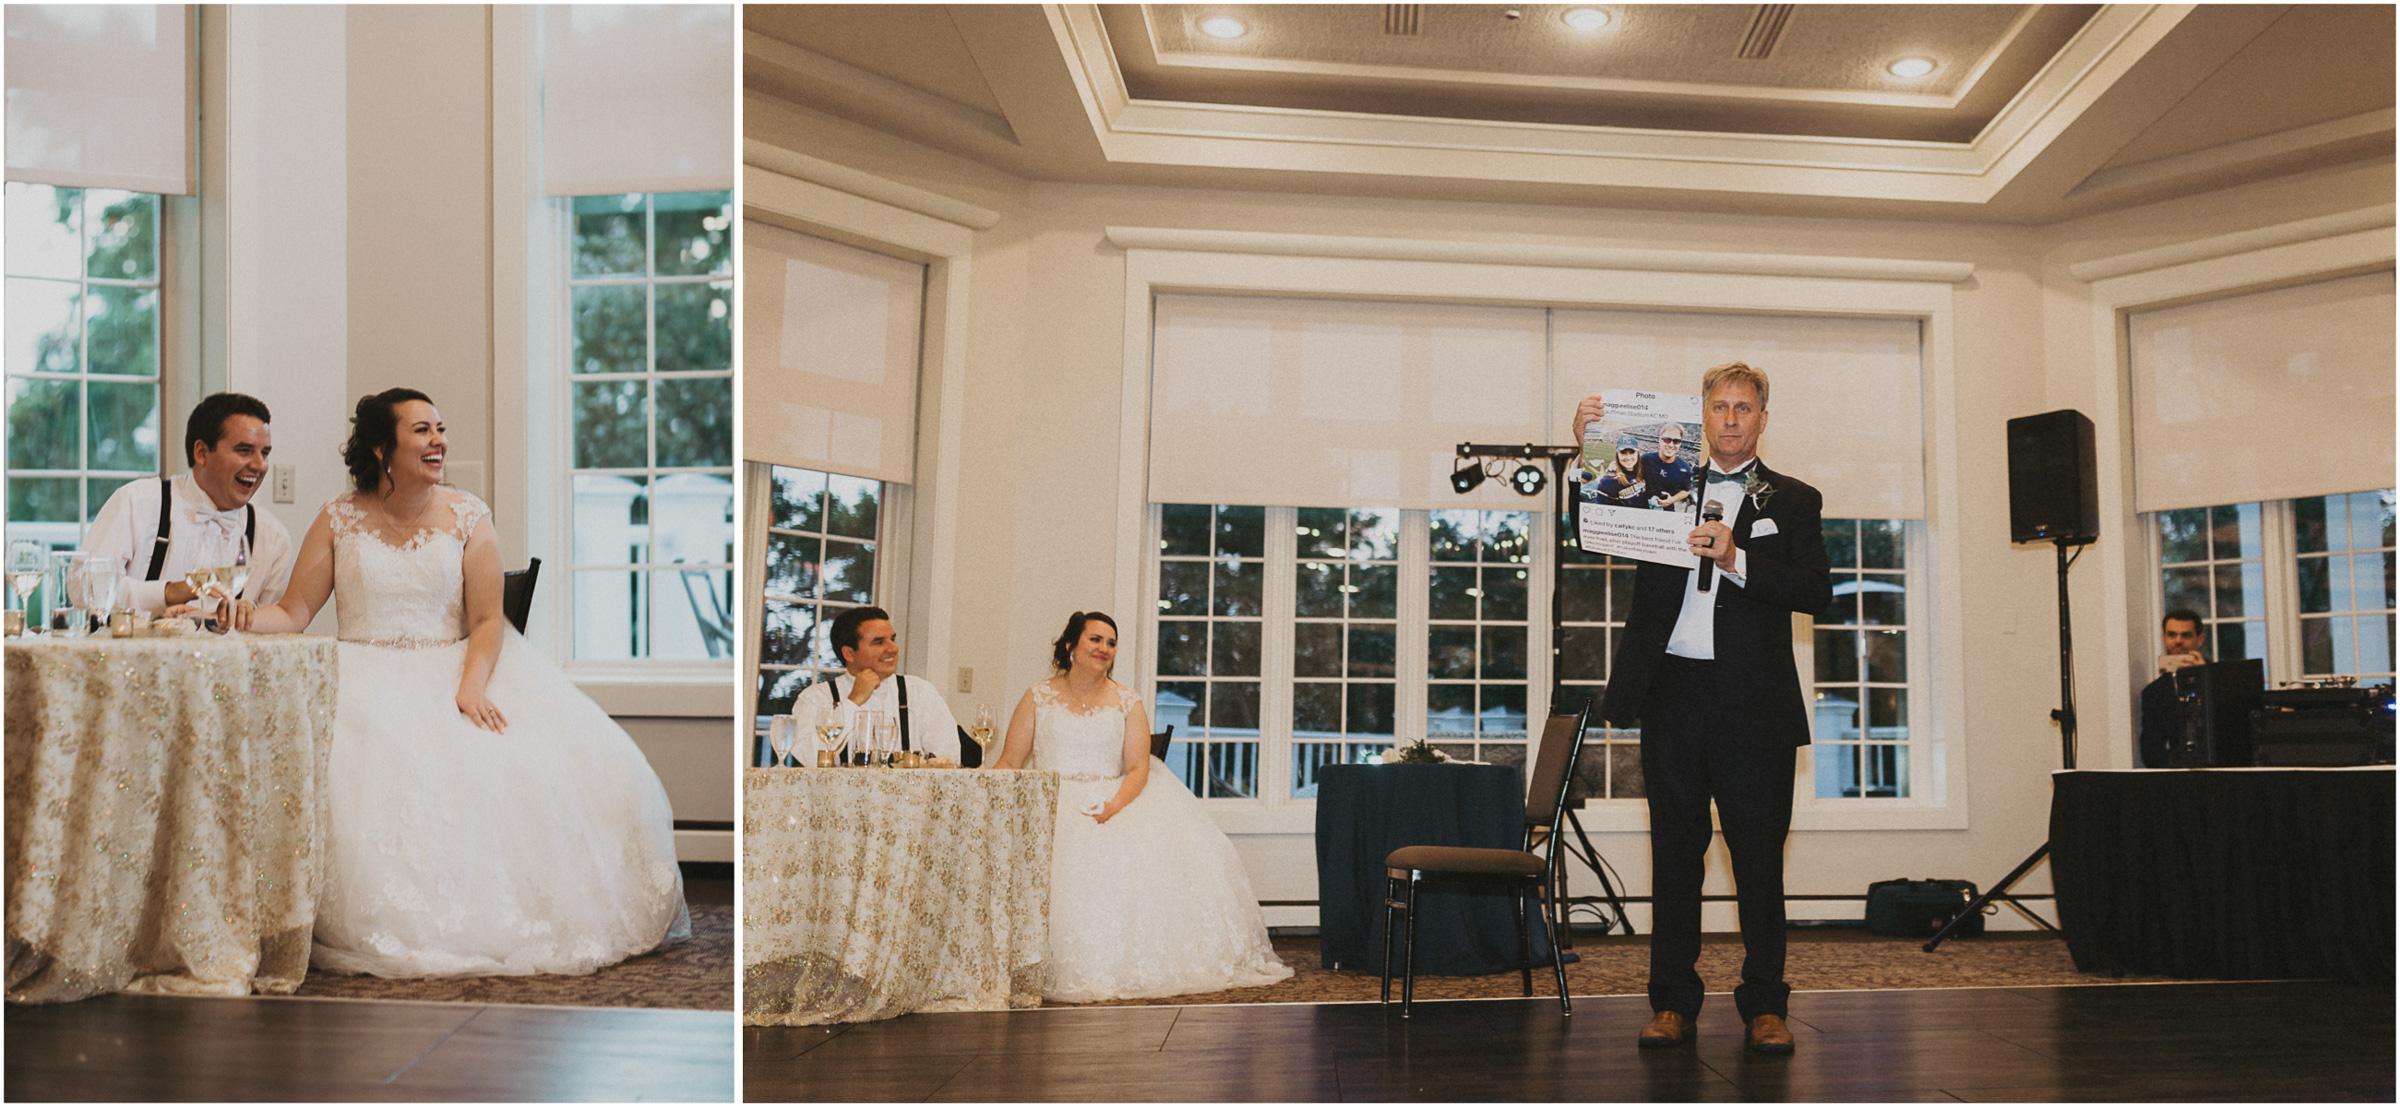 alyssa barletter photography classic kansas city wedding loose park plaza country club summer wedding-53.jpg